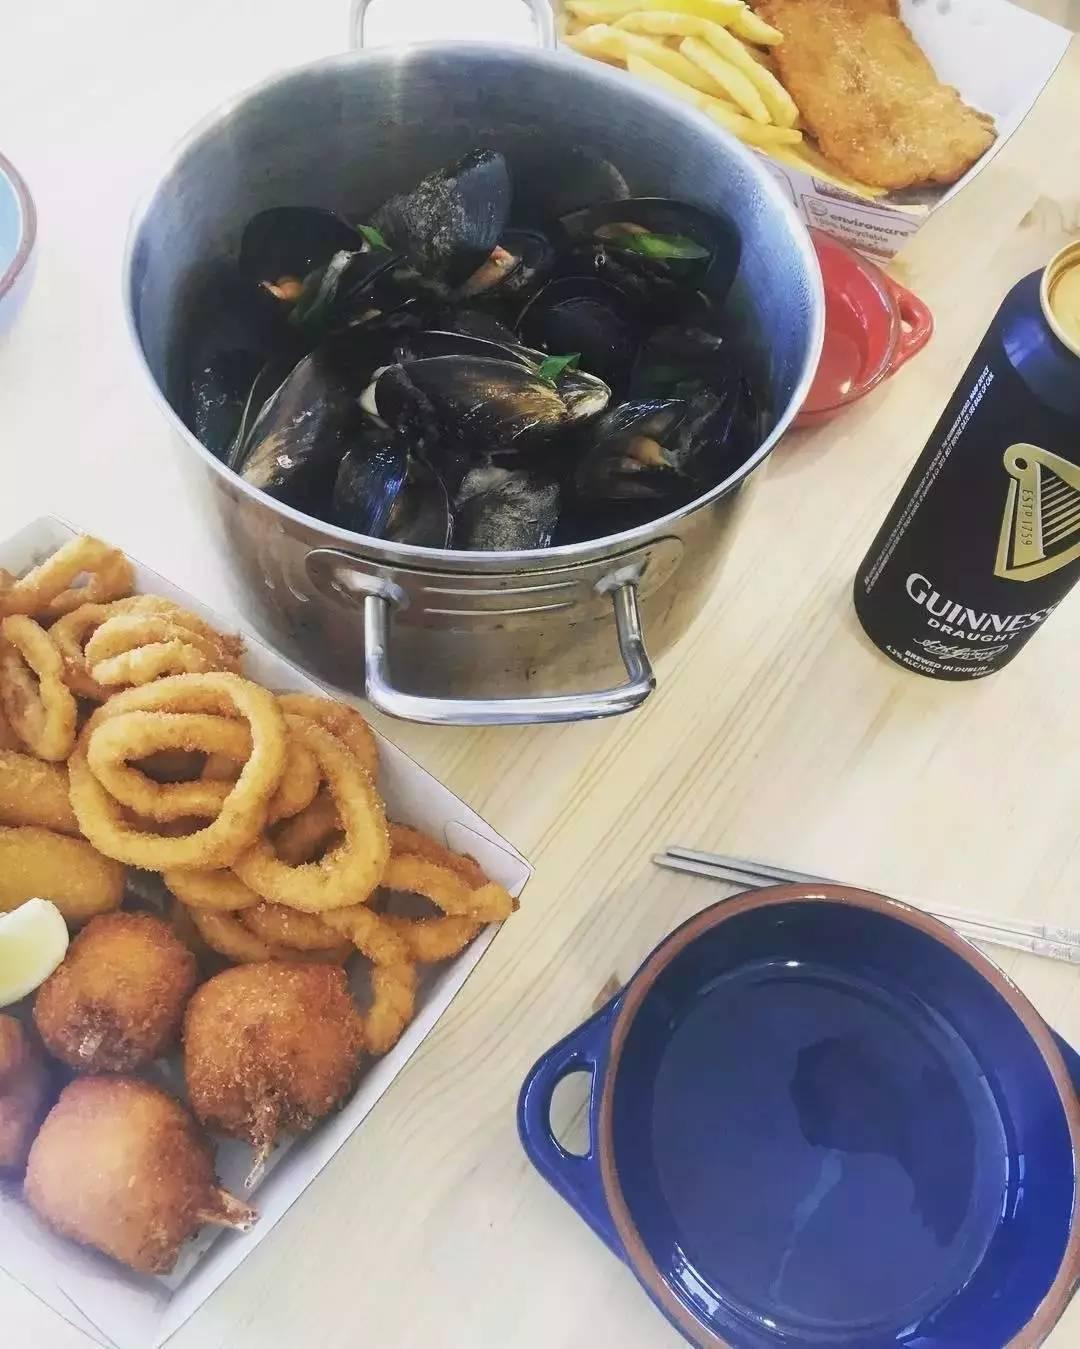 Australia在黄金海岸想吃到最新鲜的海产,绝对要去海鲜市场!